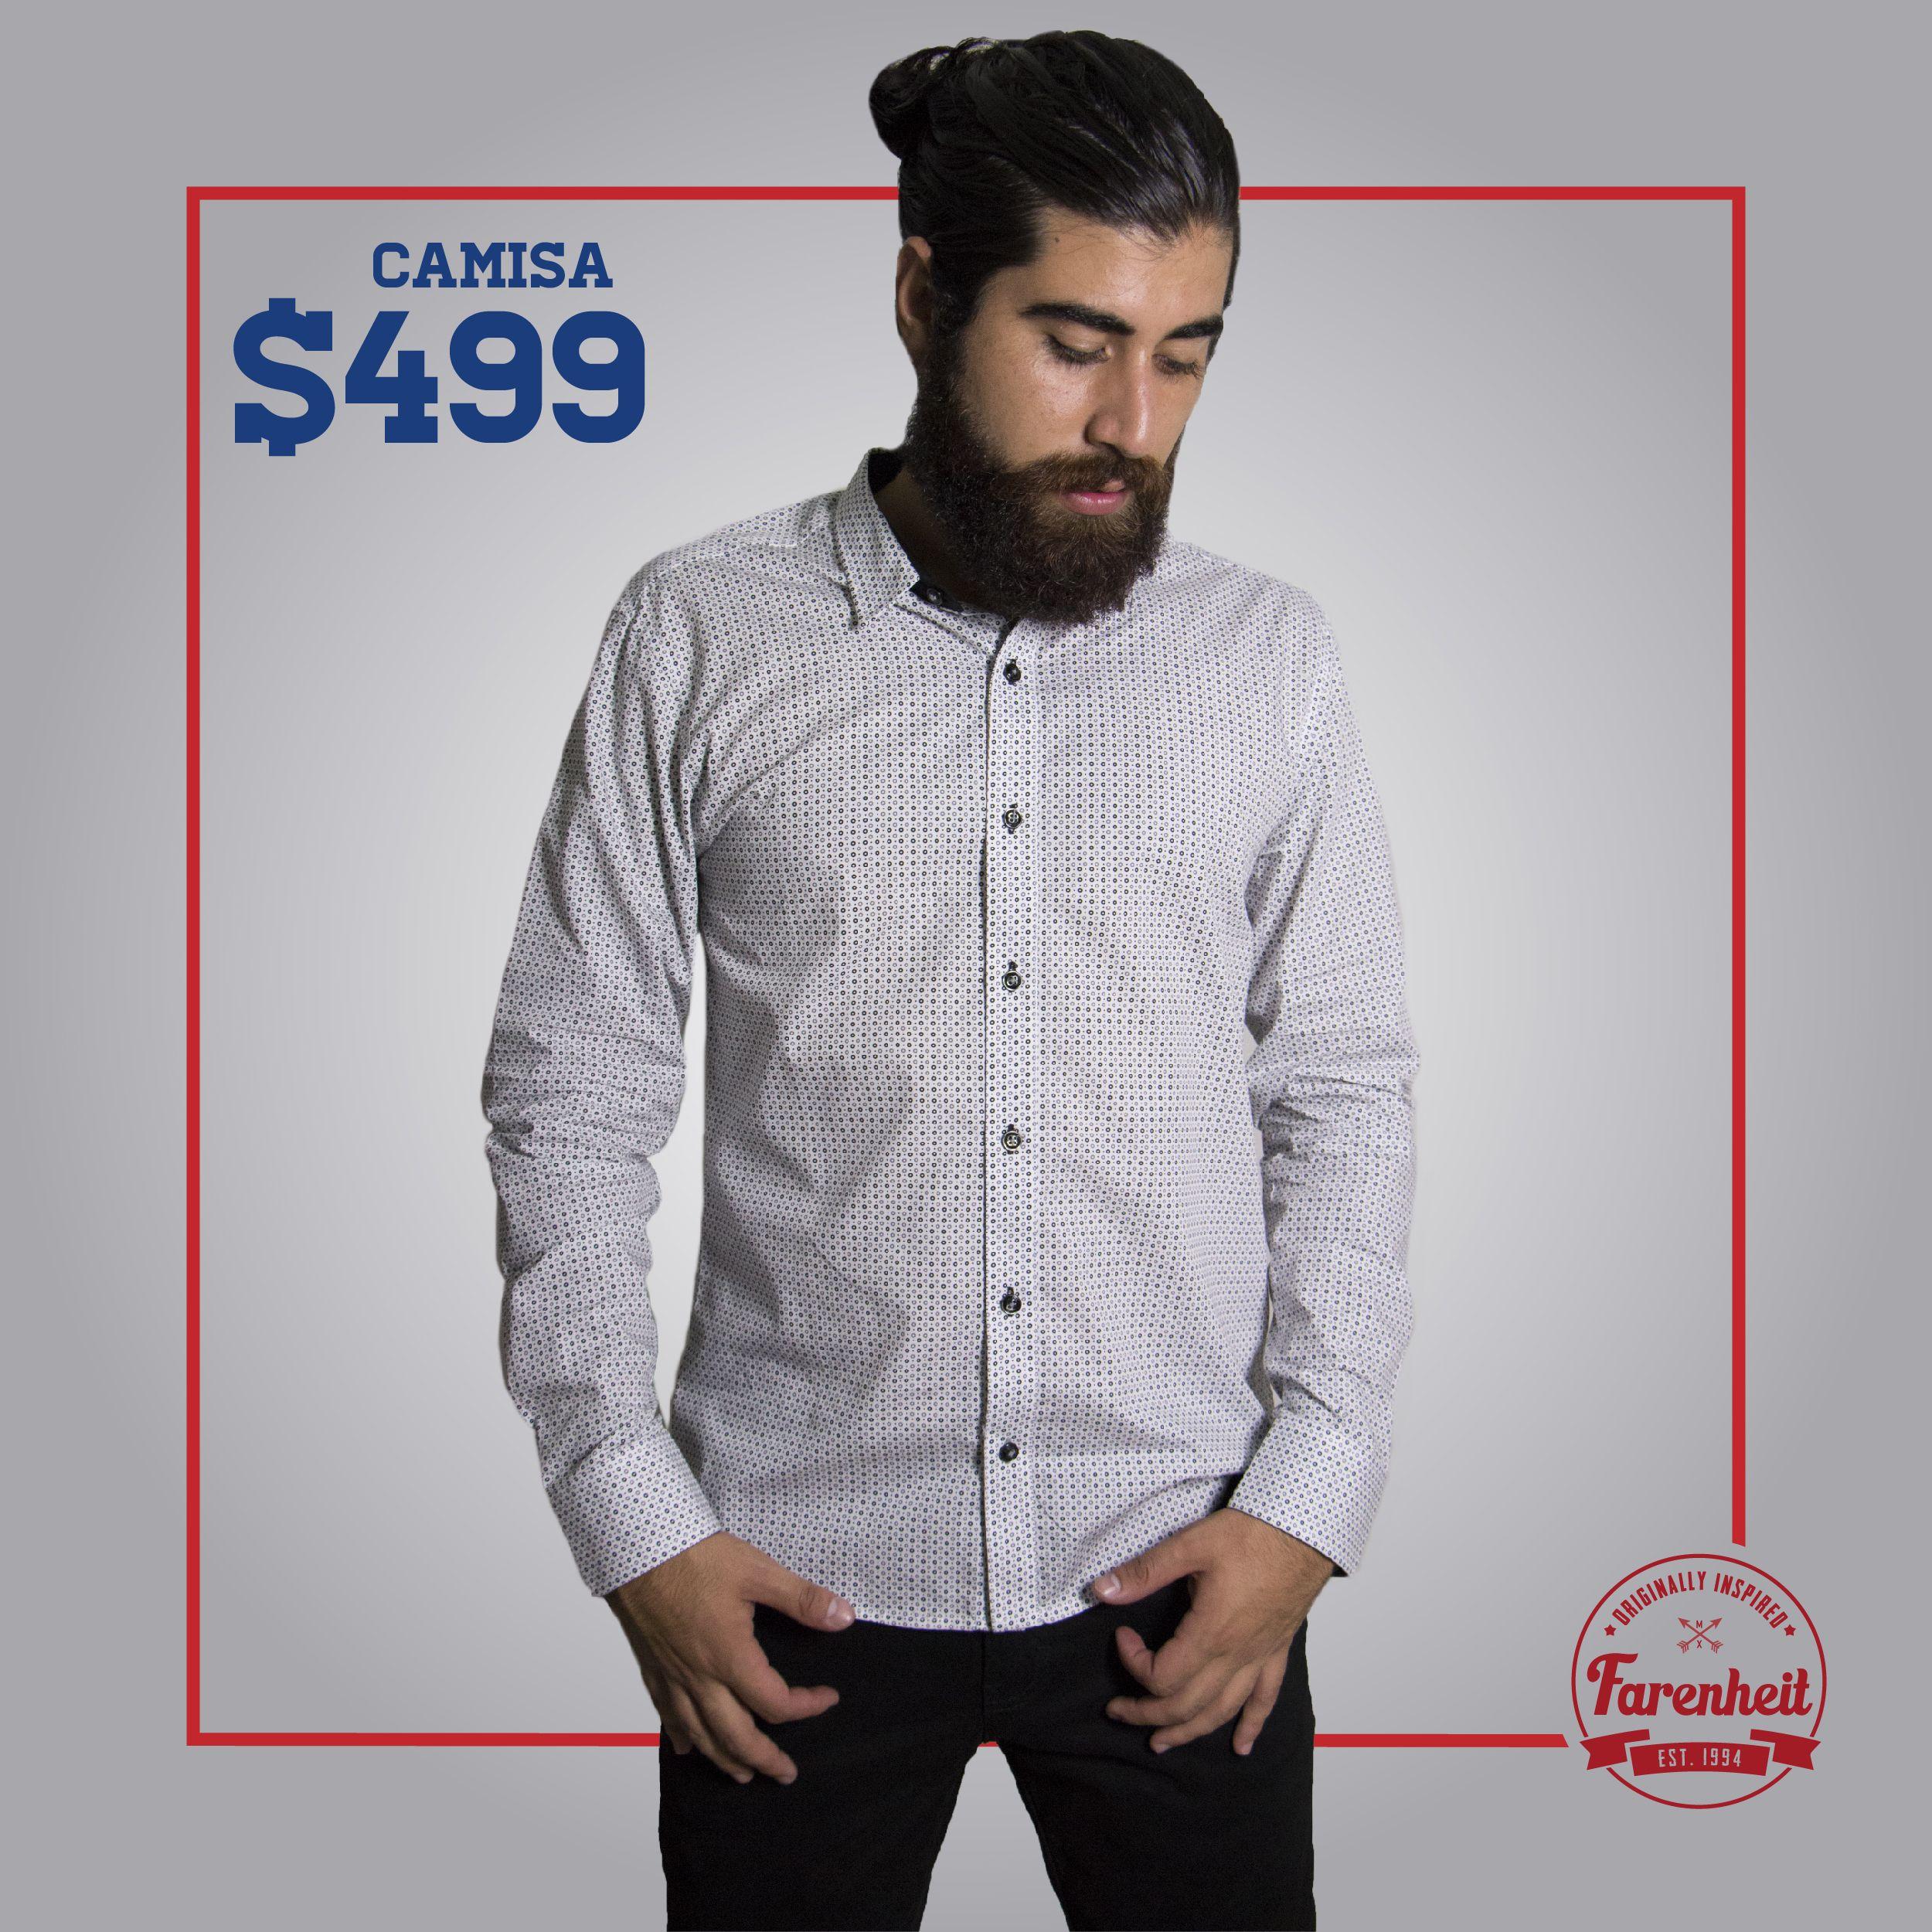 b66990805fc5e Camisa blanca con puntos negros Código  14520 Precio   499